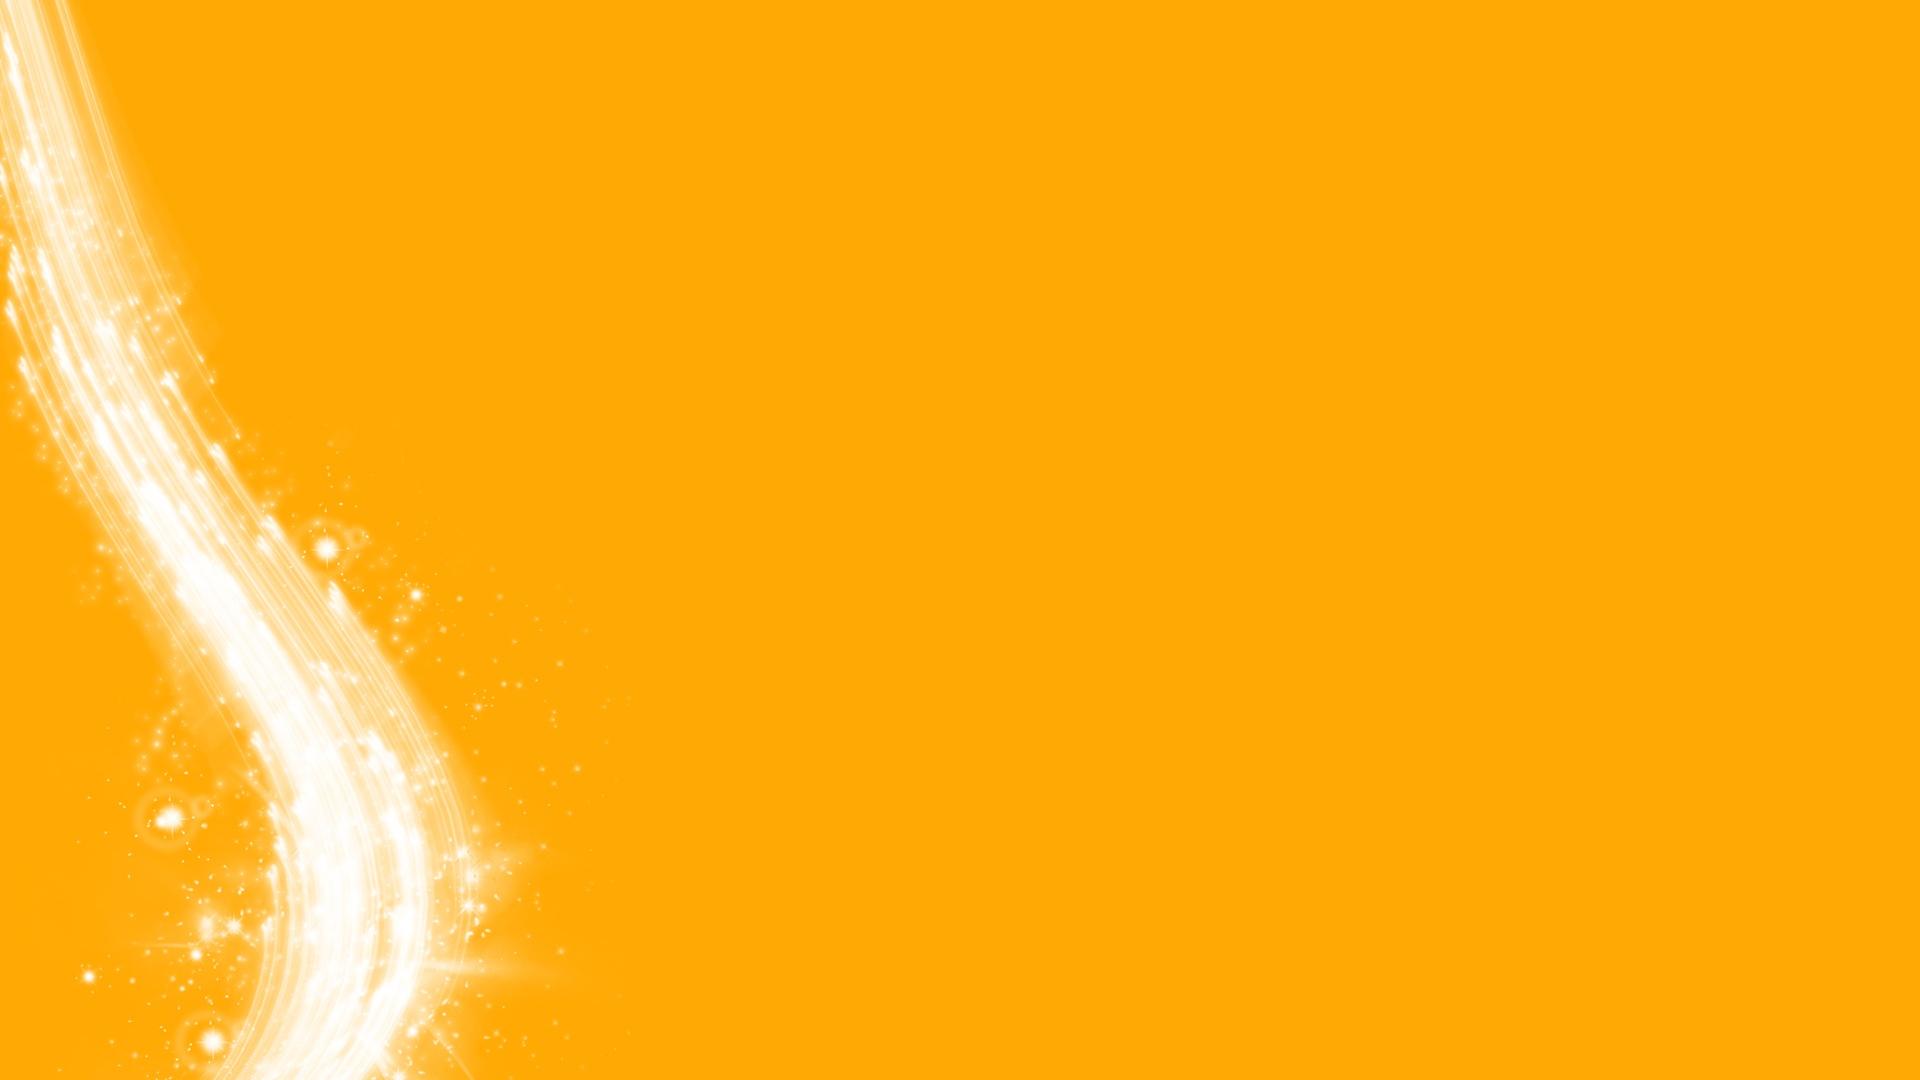 patterns orange wallpapers wallpaper 1920x1080 1920x1080